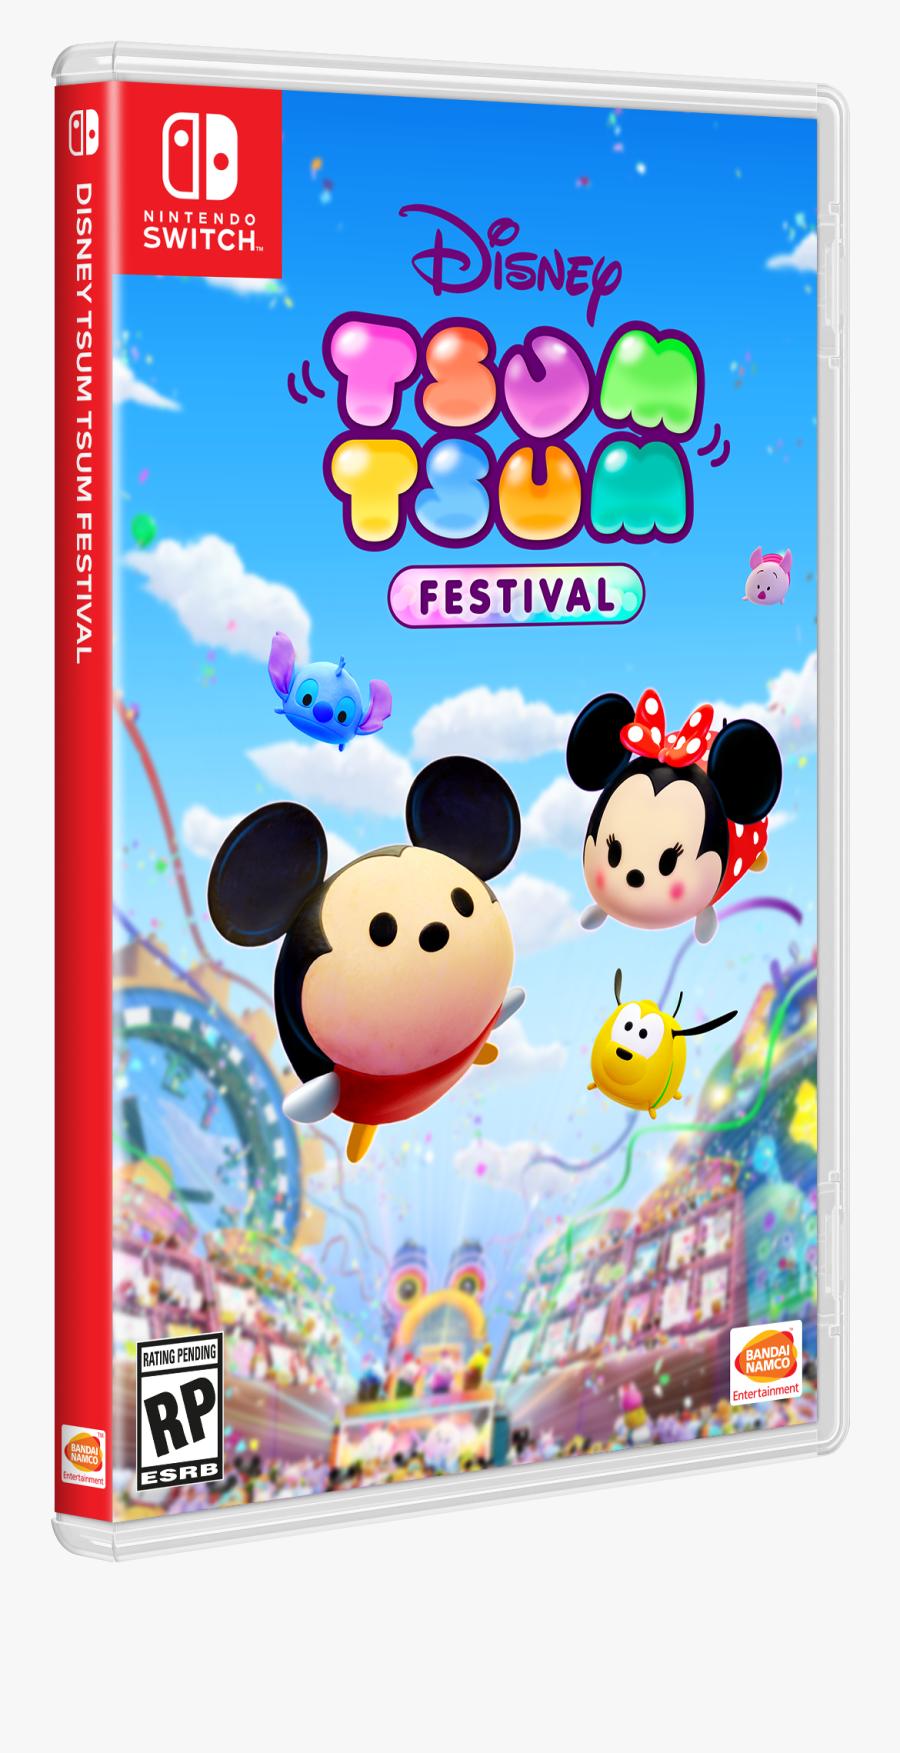 Disney Tsum Tsum Festival, Transparent Clipart